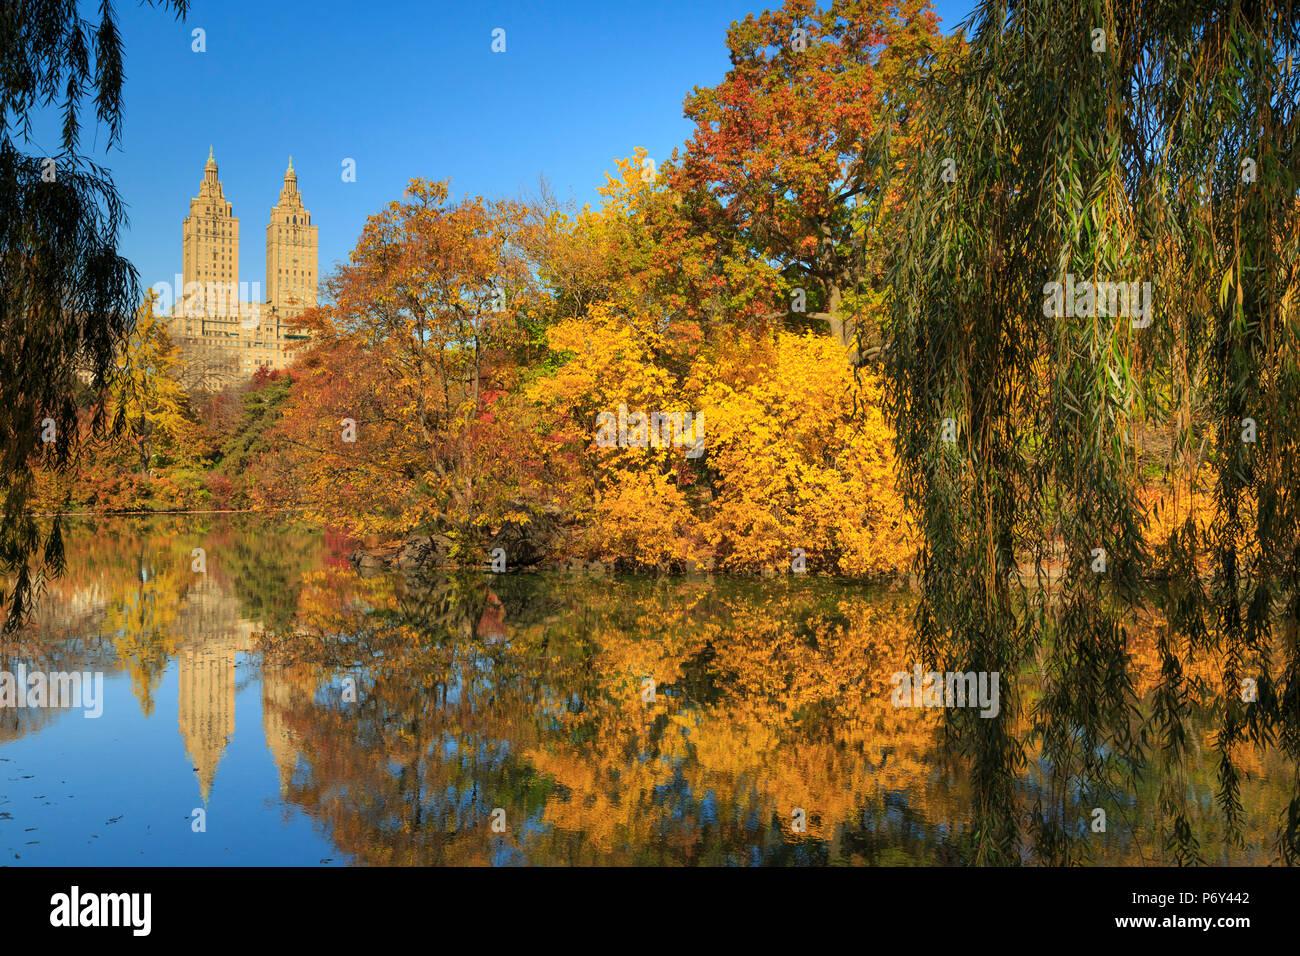 USA, New York City, Manhattan, Central Park Stock Photo